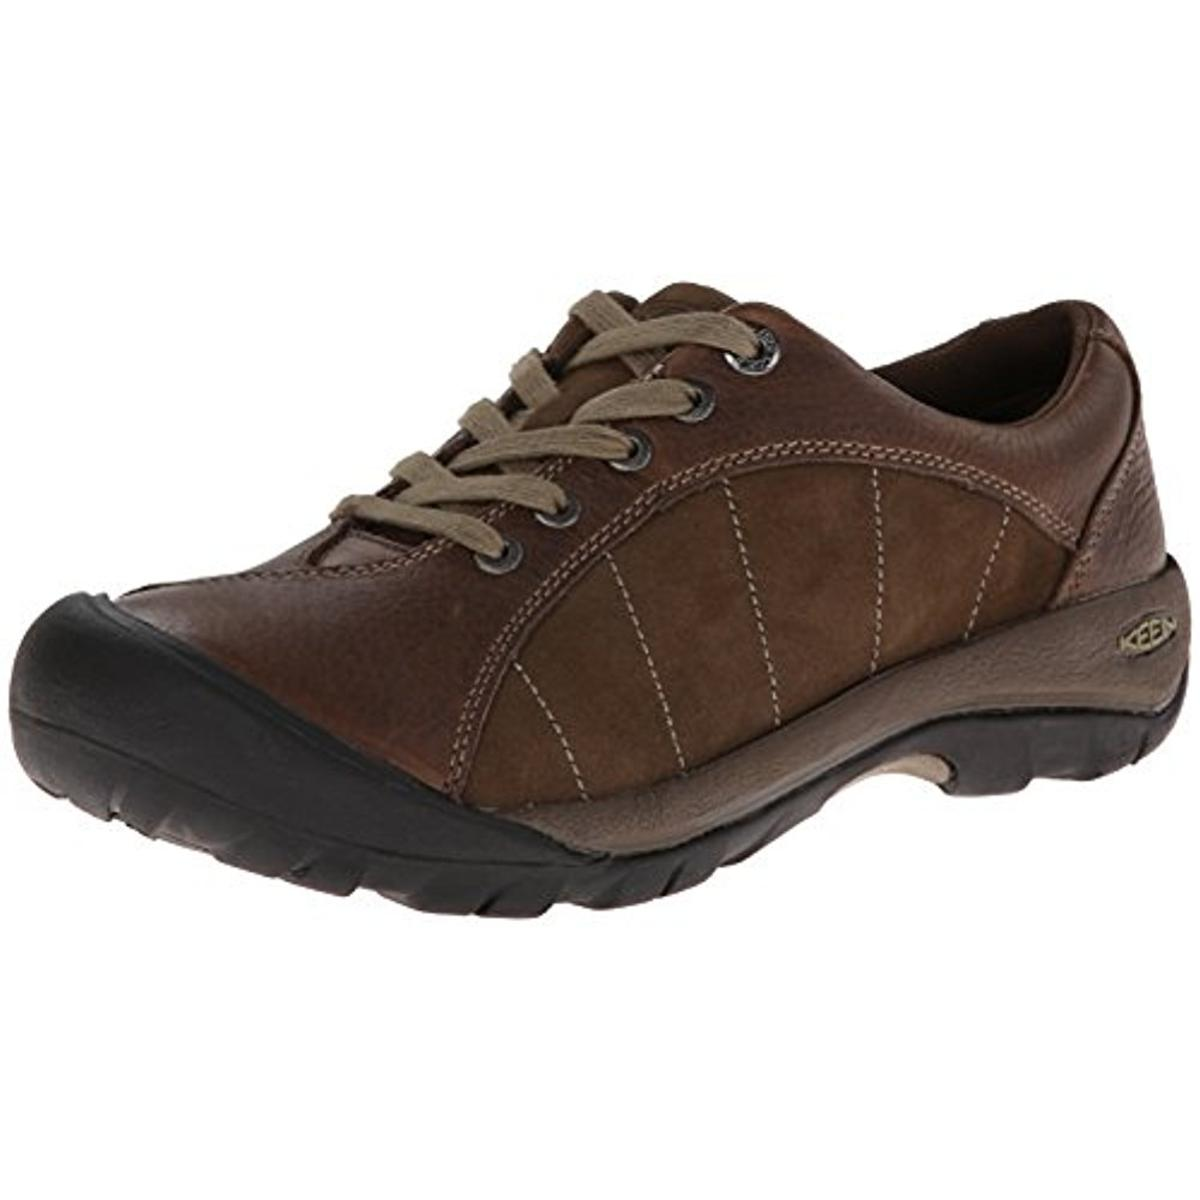 Keen Keen Womens Presidio Leather Casual Oxfords Brown 8 Medium B